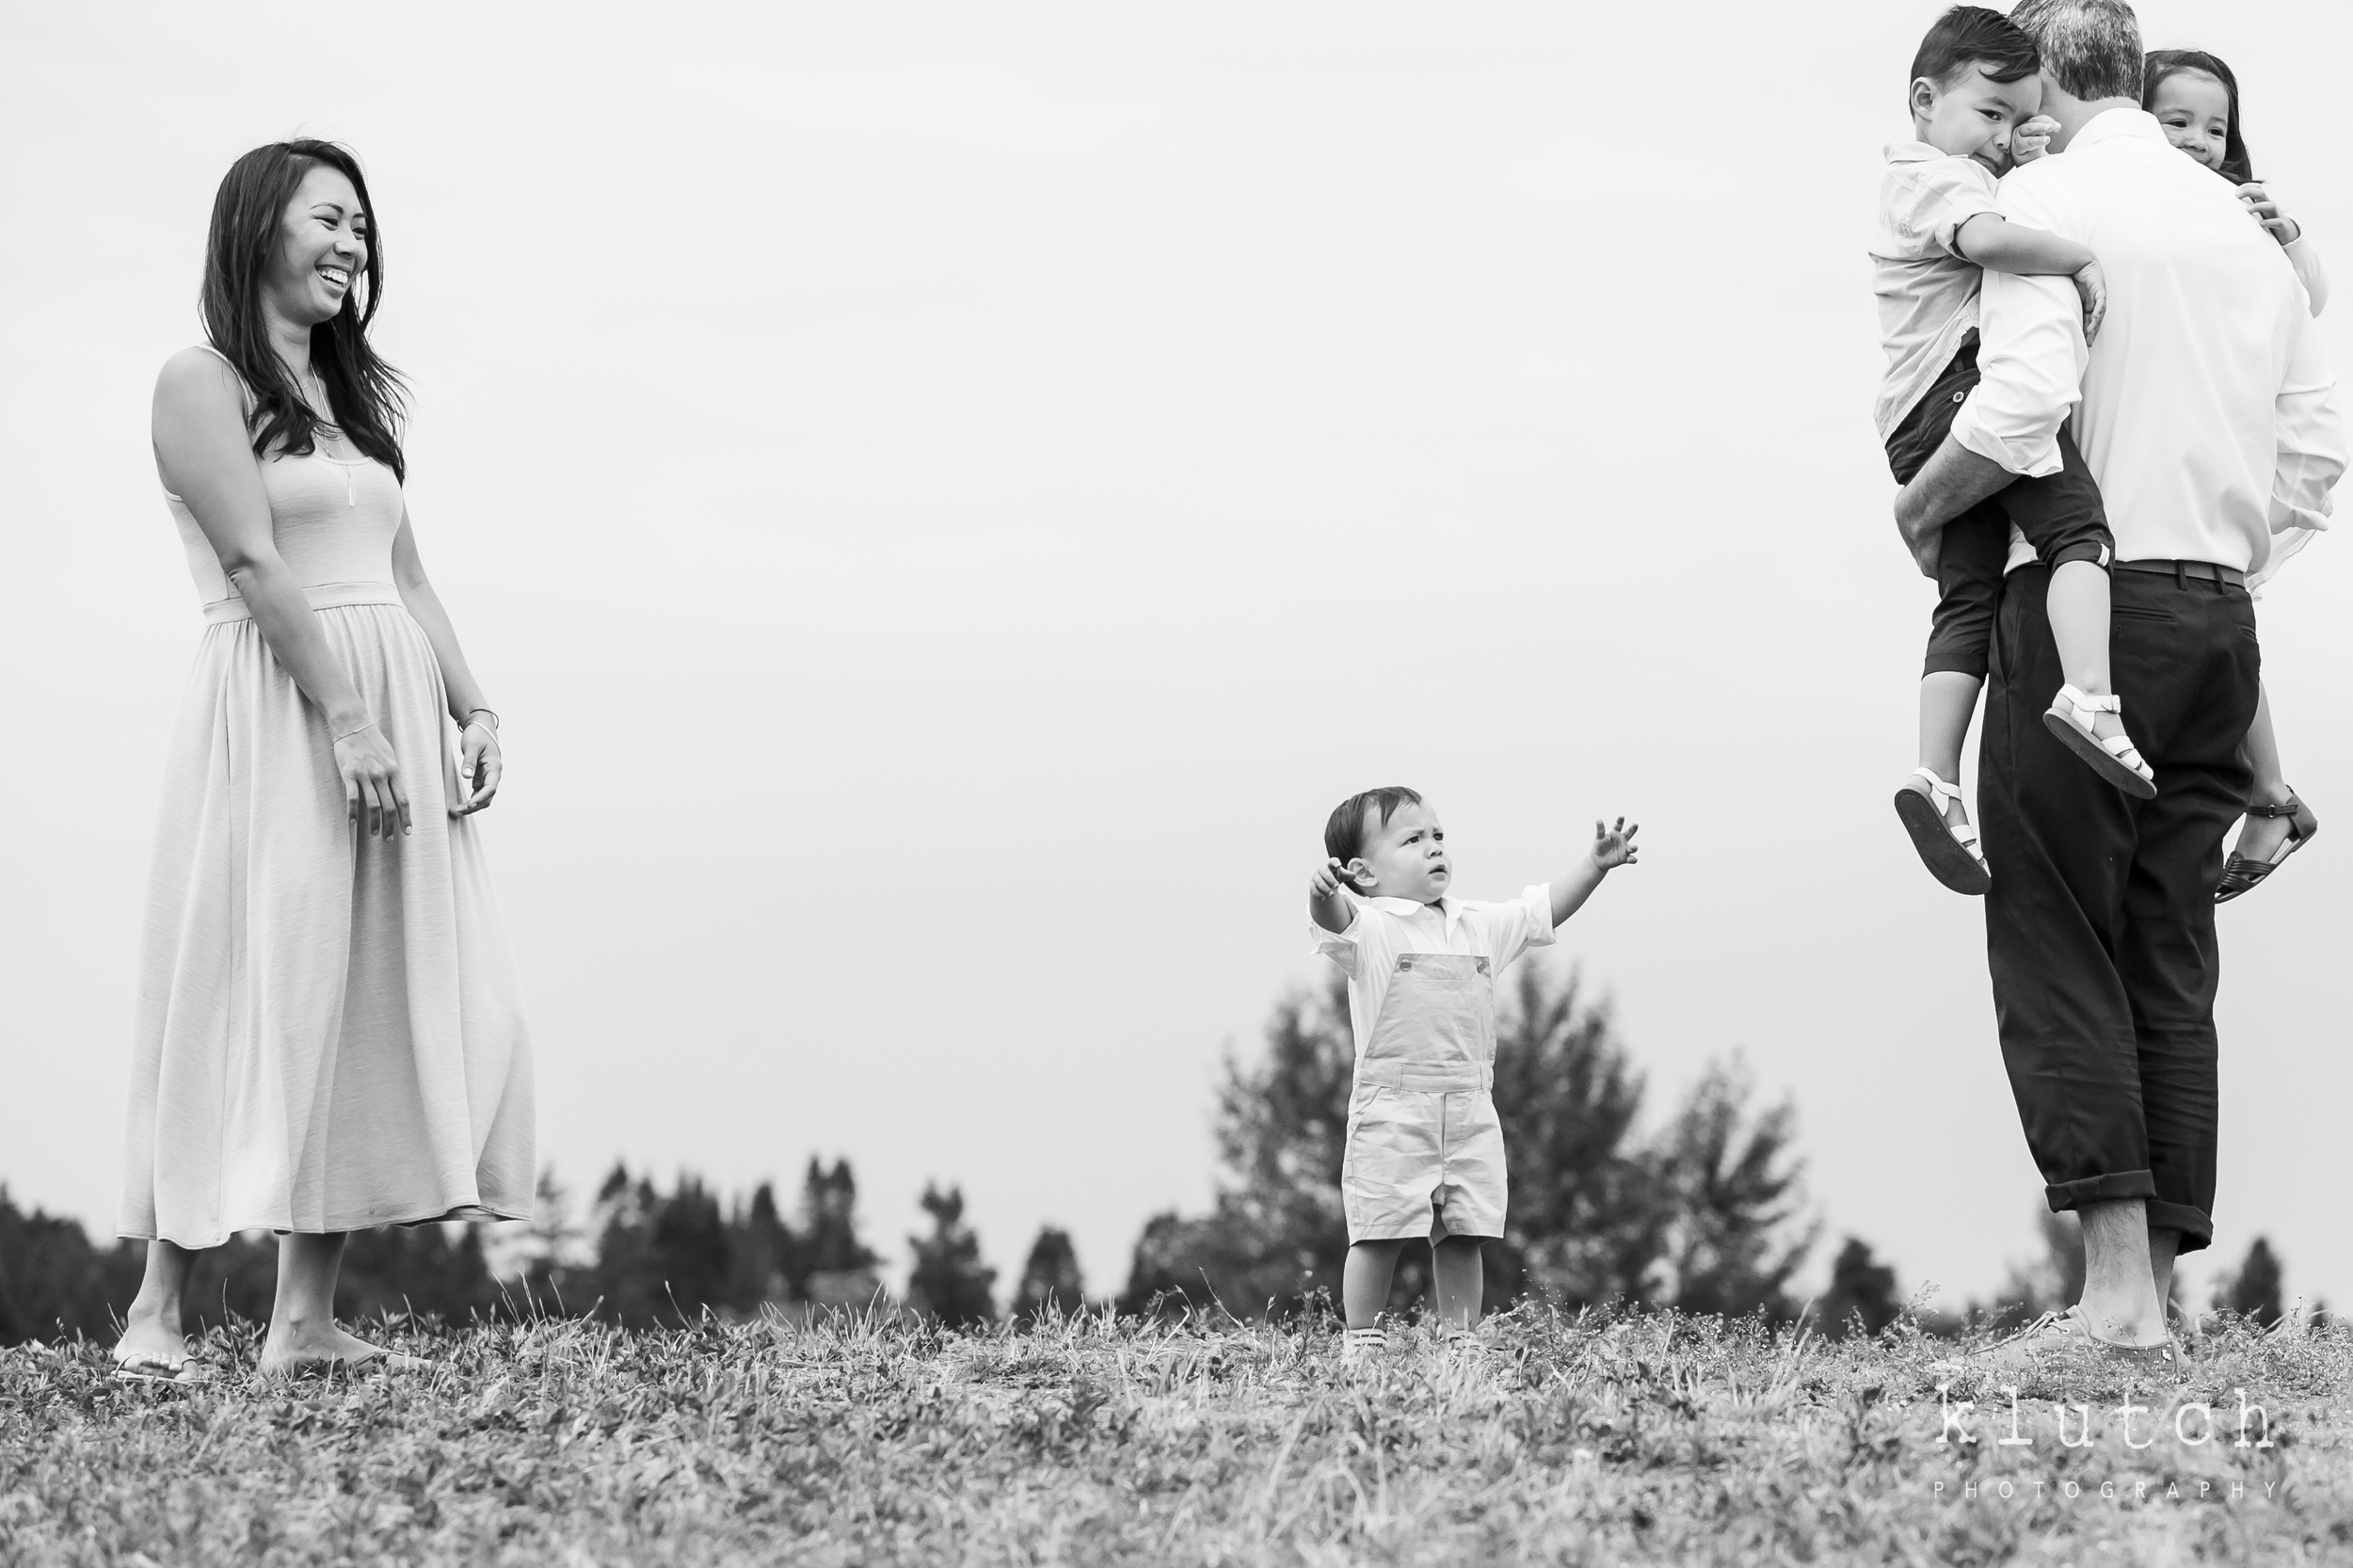 Klutch Photography,white rock family photographer, vancouver family photographer, whiterock lifestyle photographer, life unscripted photographer, life unscripted session, photography,Dina Ferreira Stoddard-.jpg